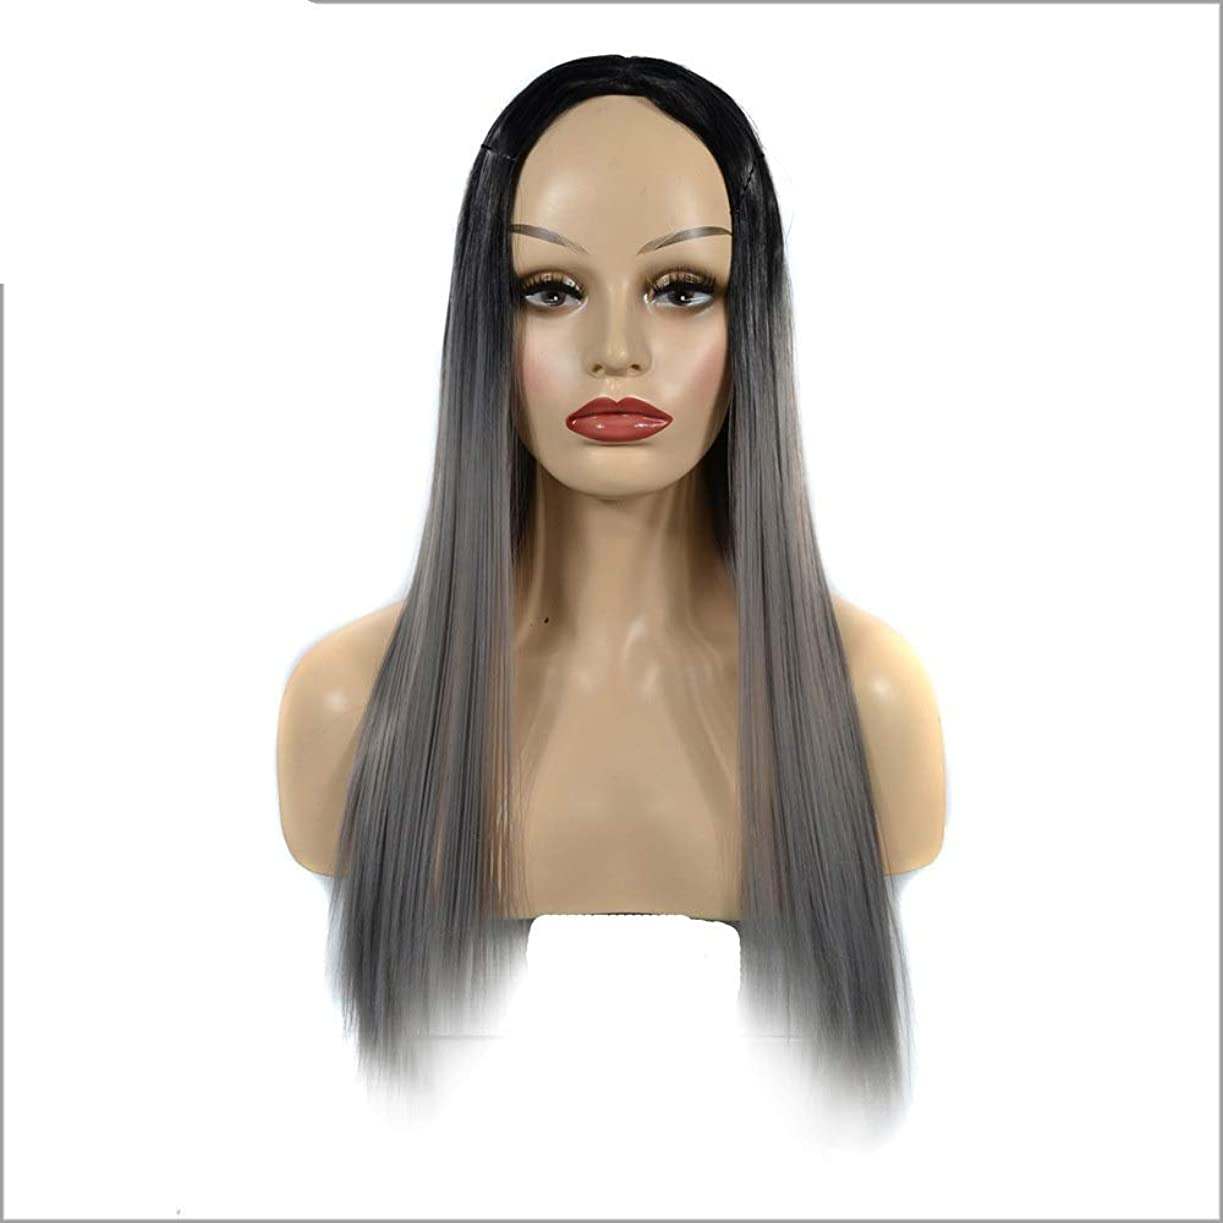 HOHYLLYA ブラックグラデーションシルバーグレーかつらオンブルストレートロングウィッグ女性のための中部かつらダークルーツ耐熱ウィッグパーティーかつら (色 : Silver Grey, サイズ : 60cm)